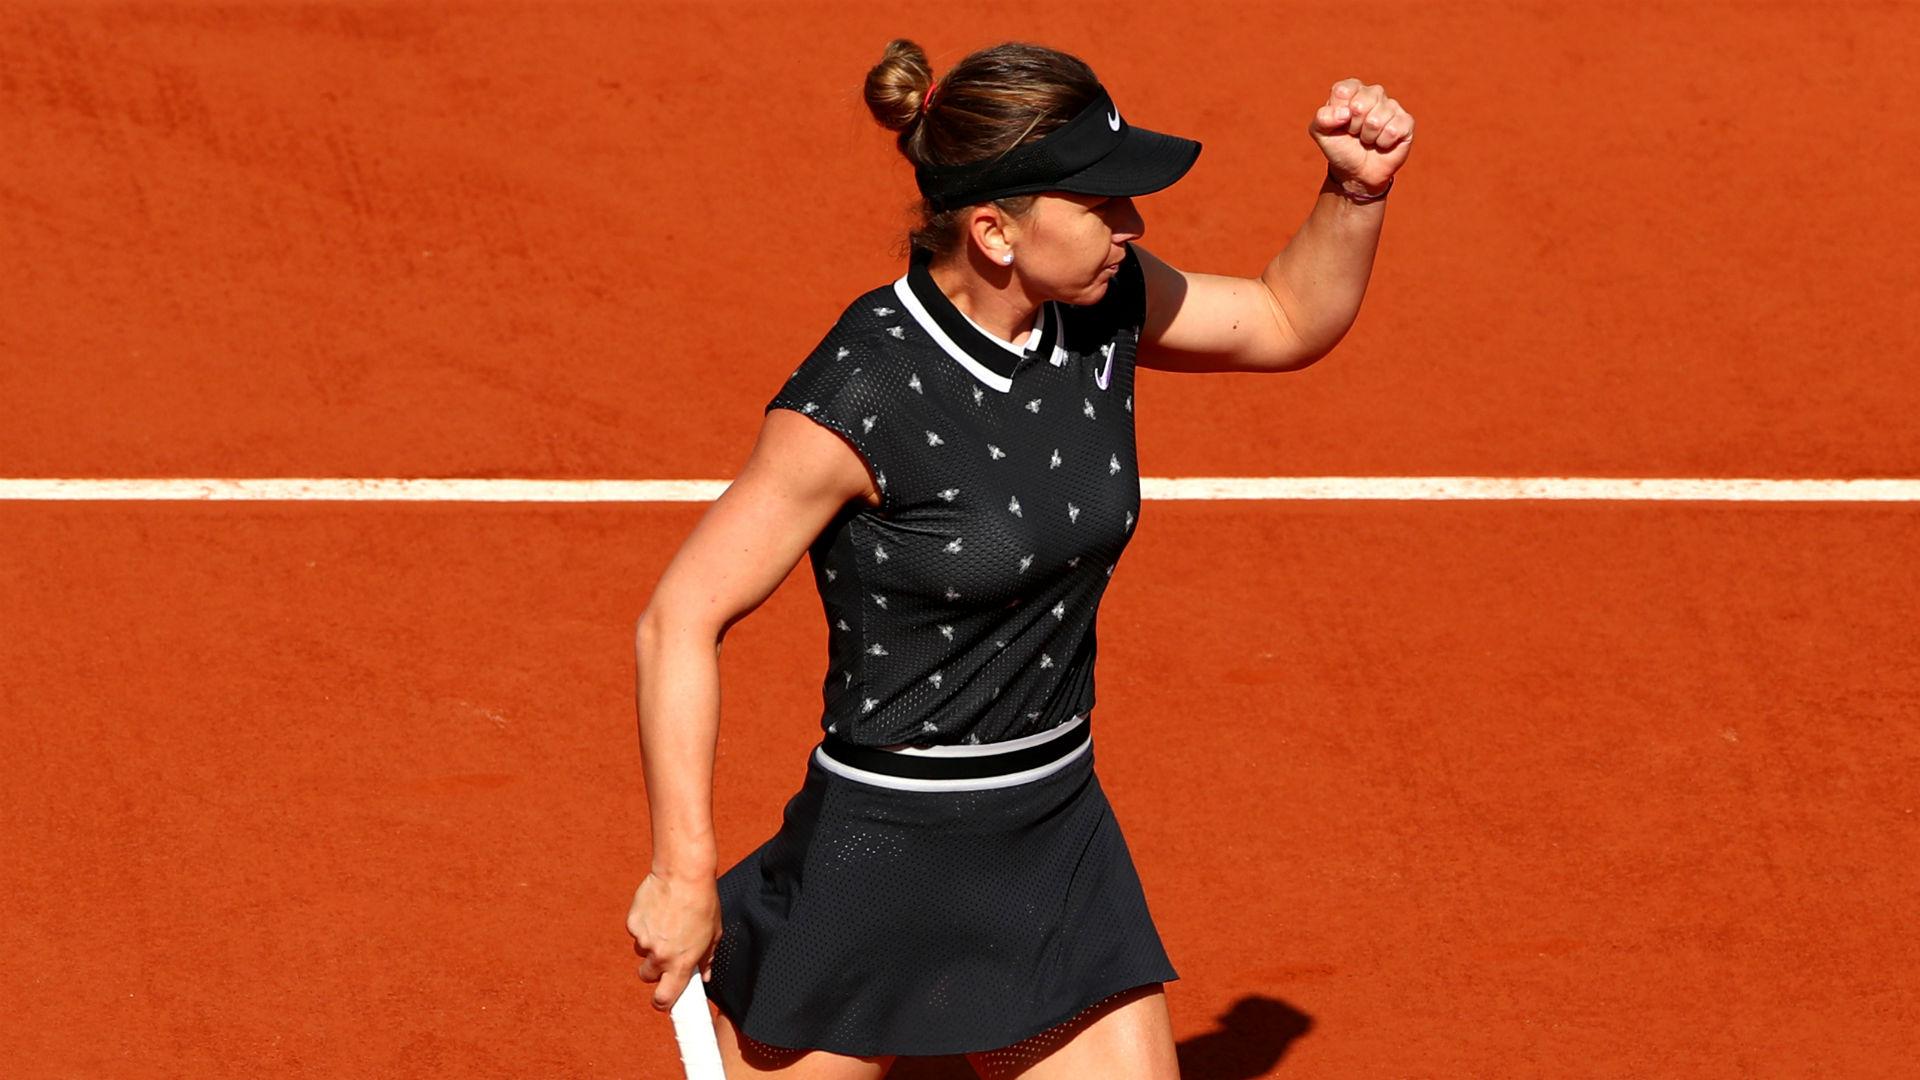 French Open quarterfinals